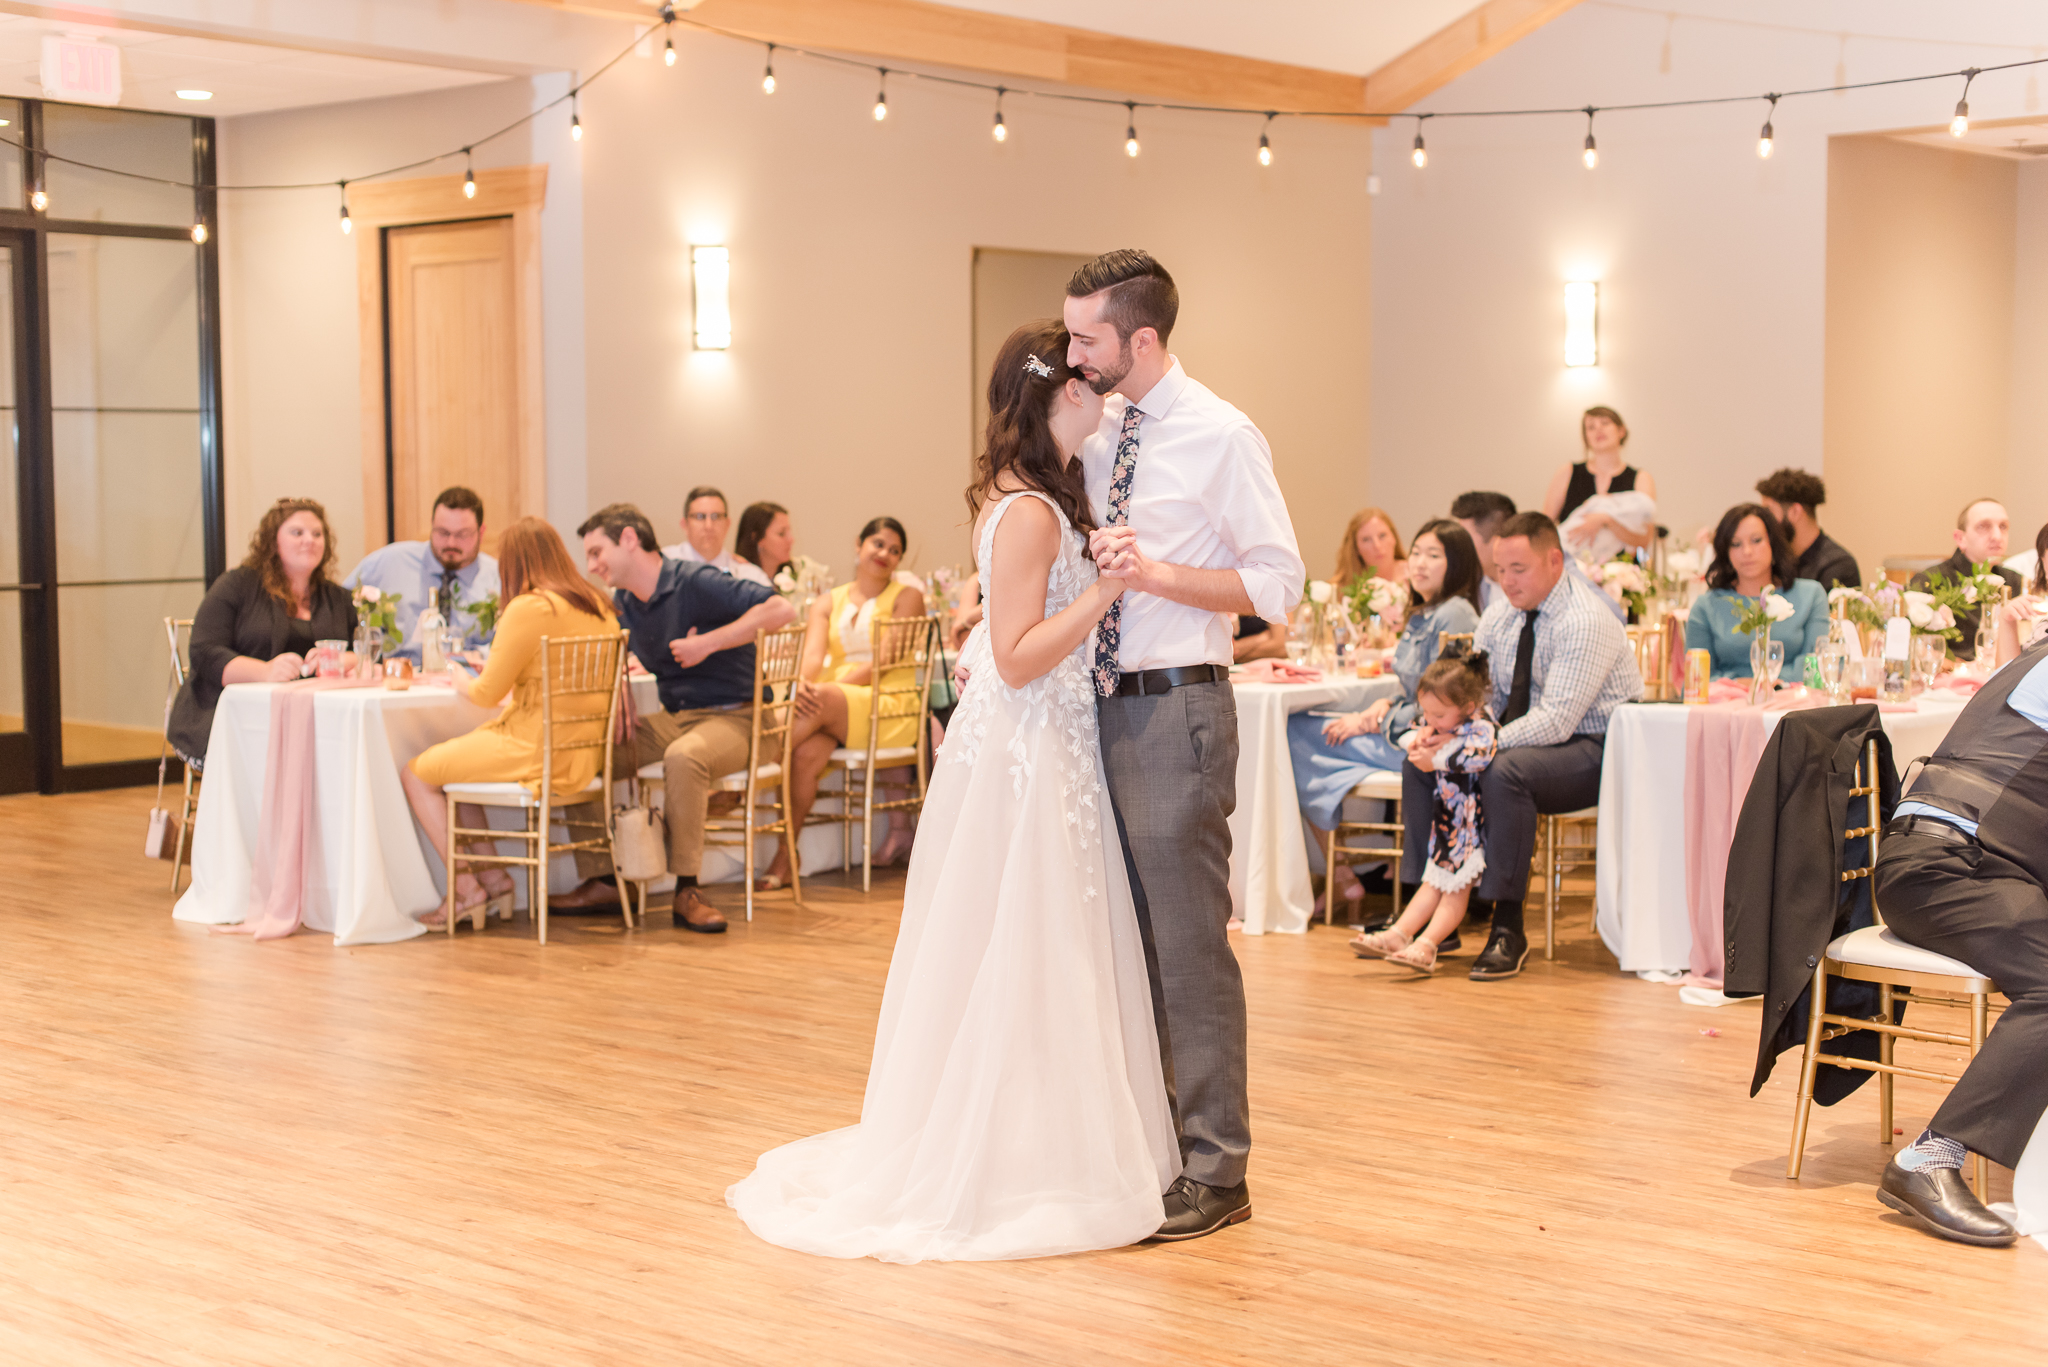 Sycamore at Mallow Run Wedding6833.jpg